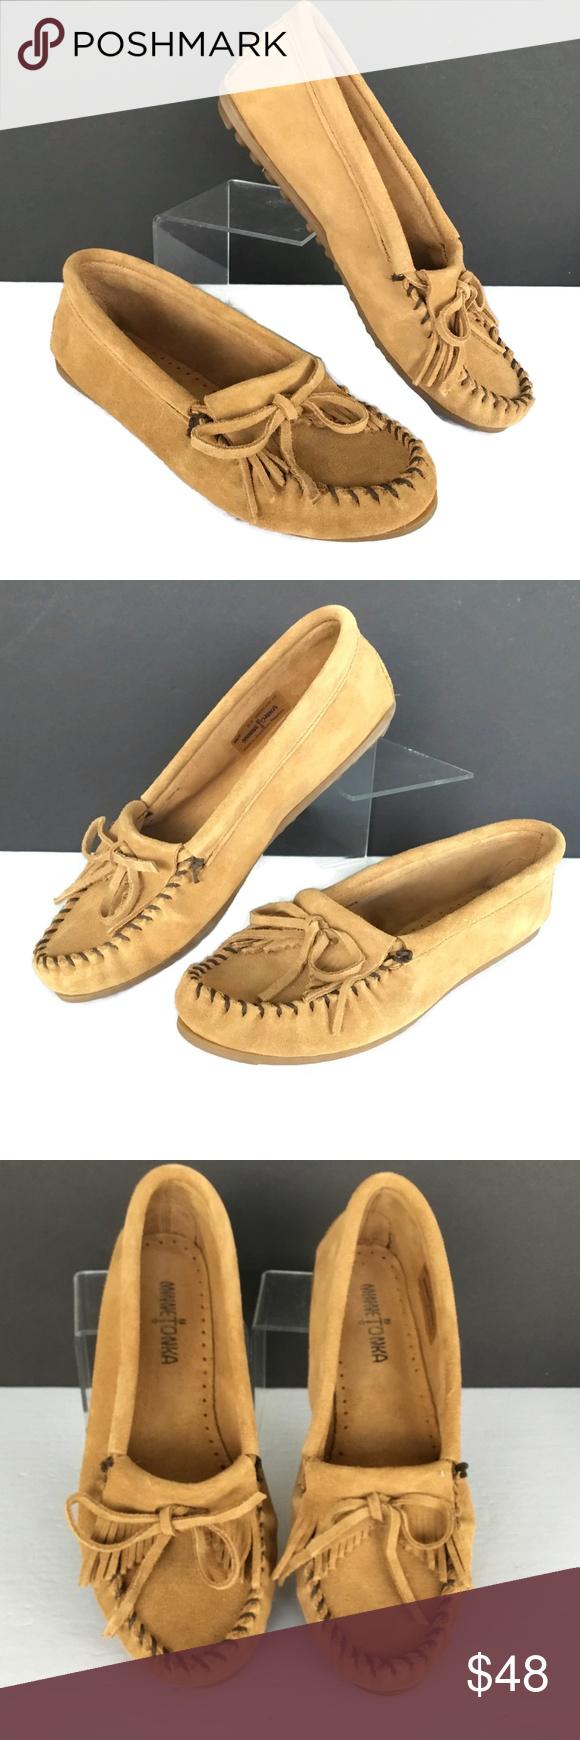 Driving Loafer Minnetonka Women Moccasins Suede Driving Moccasins Womens Moccasins Women Driving Loafers